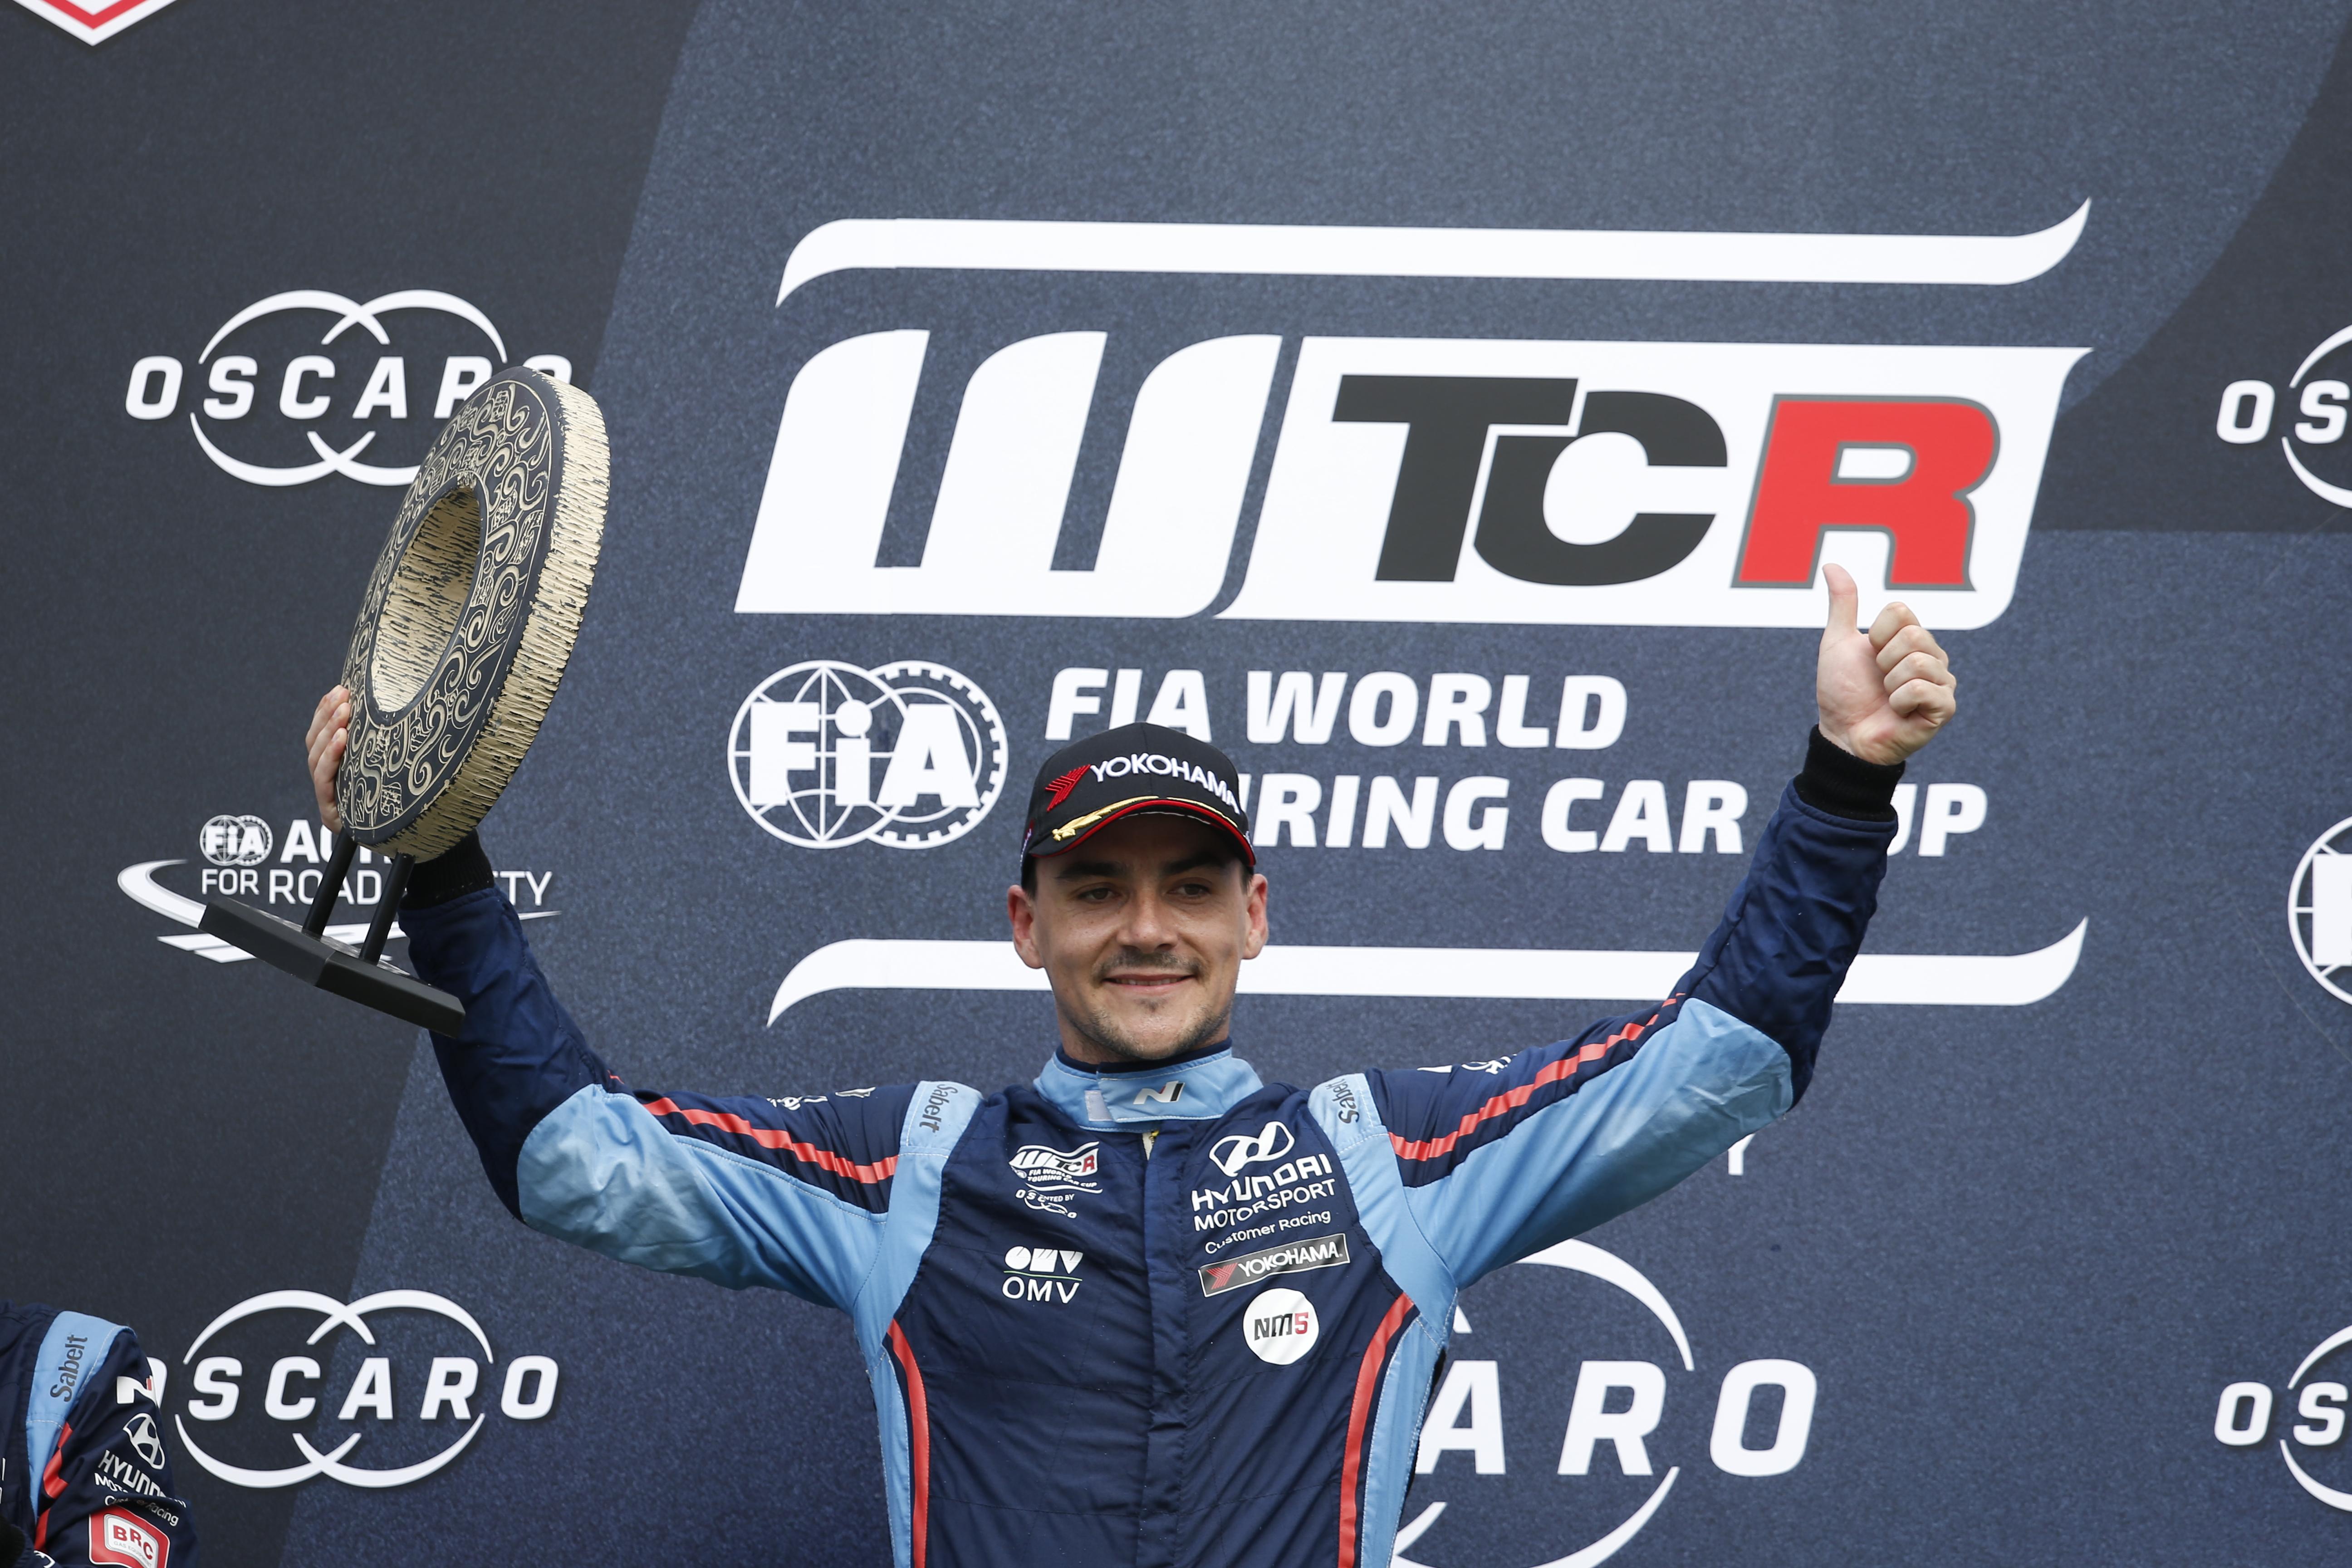 Michelisz leads on the #RoadToMalaysia following China WTCR triumph